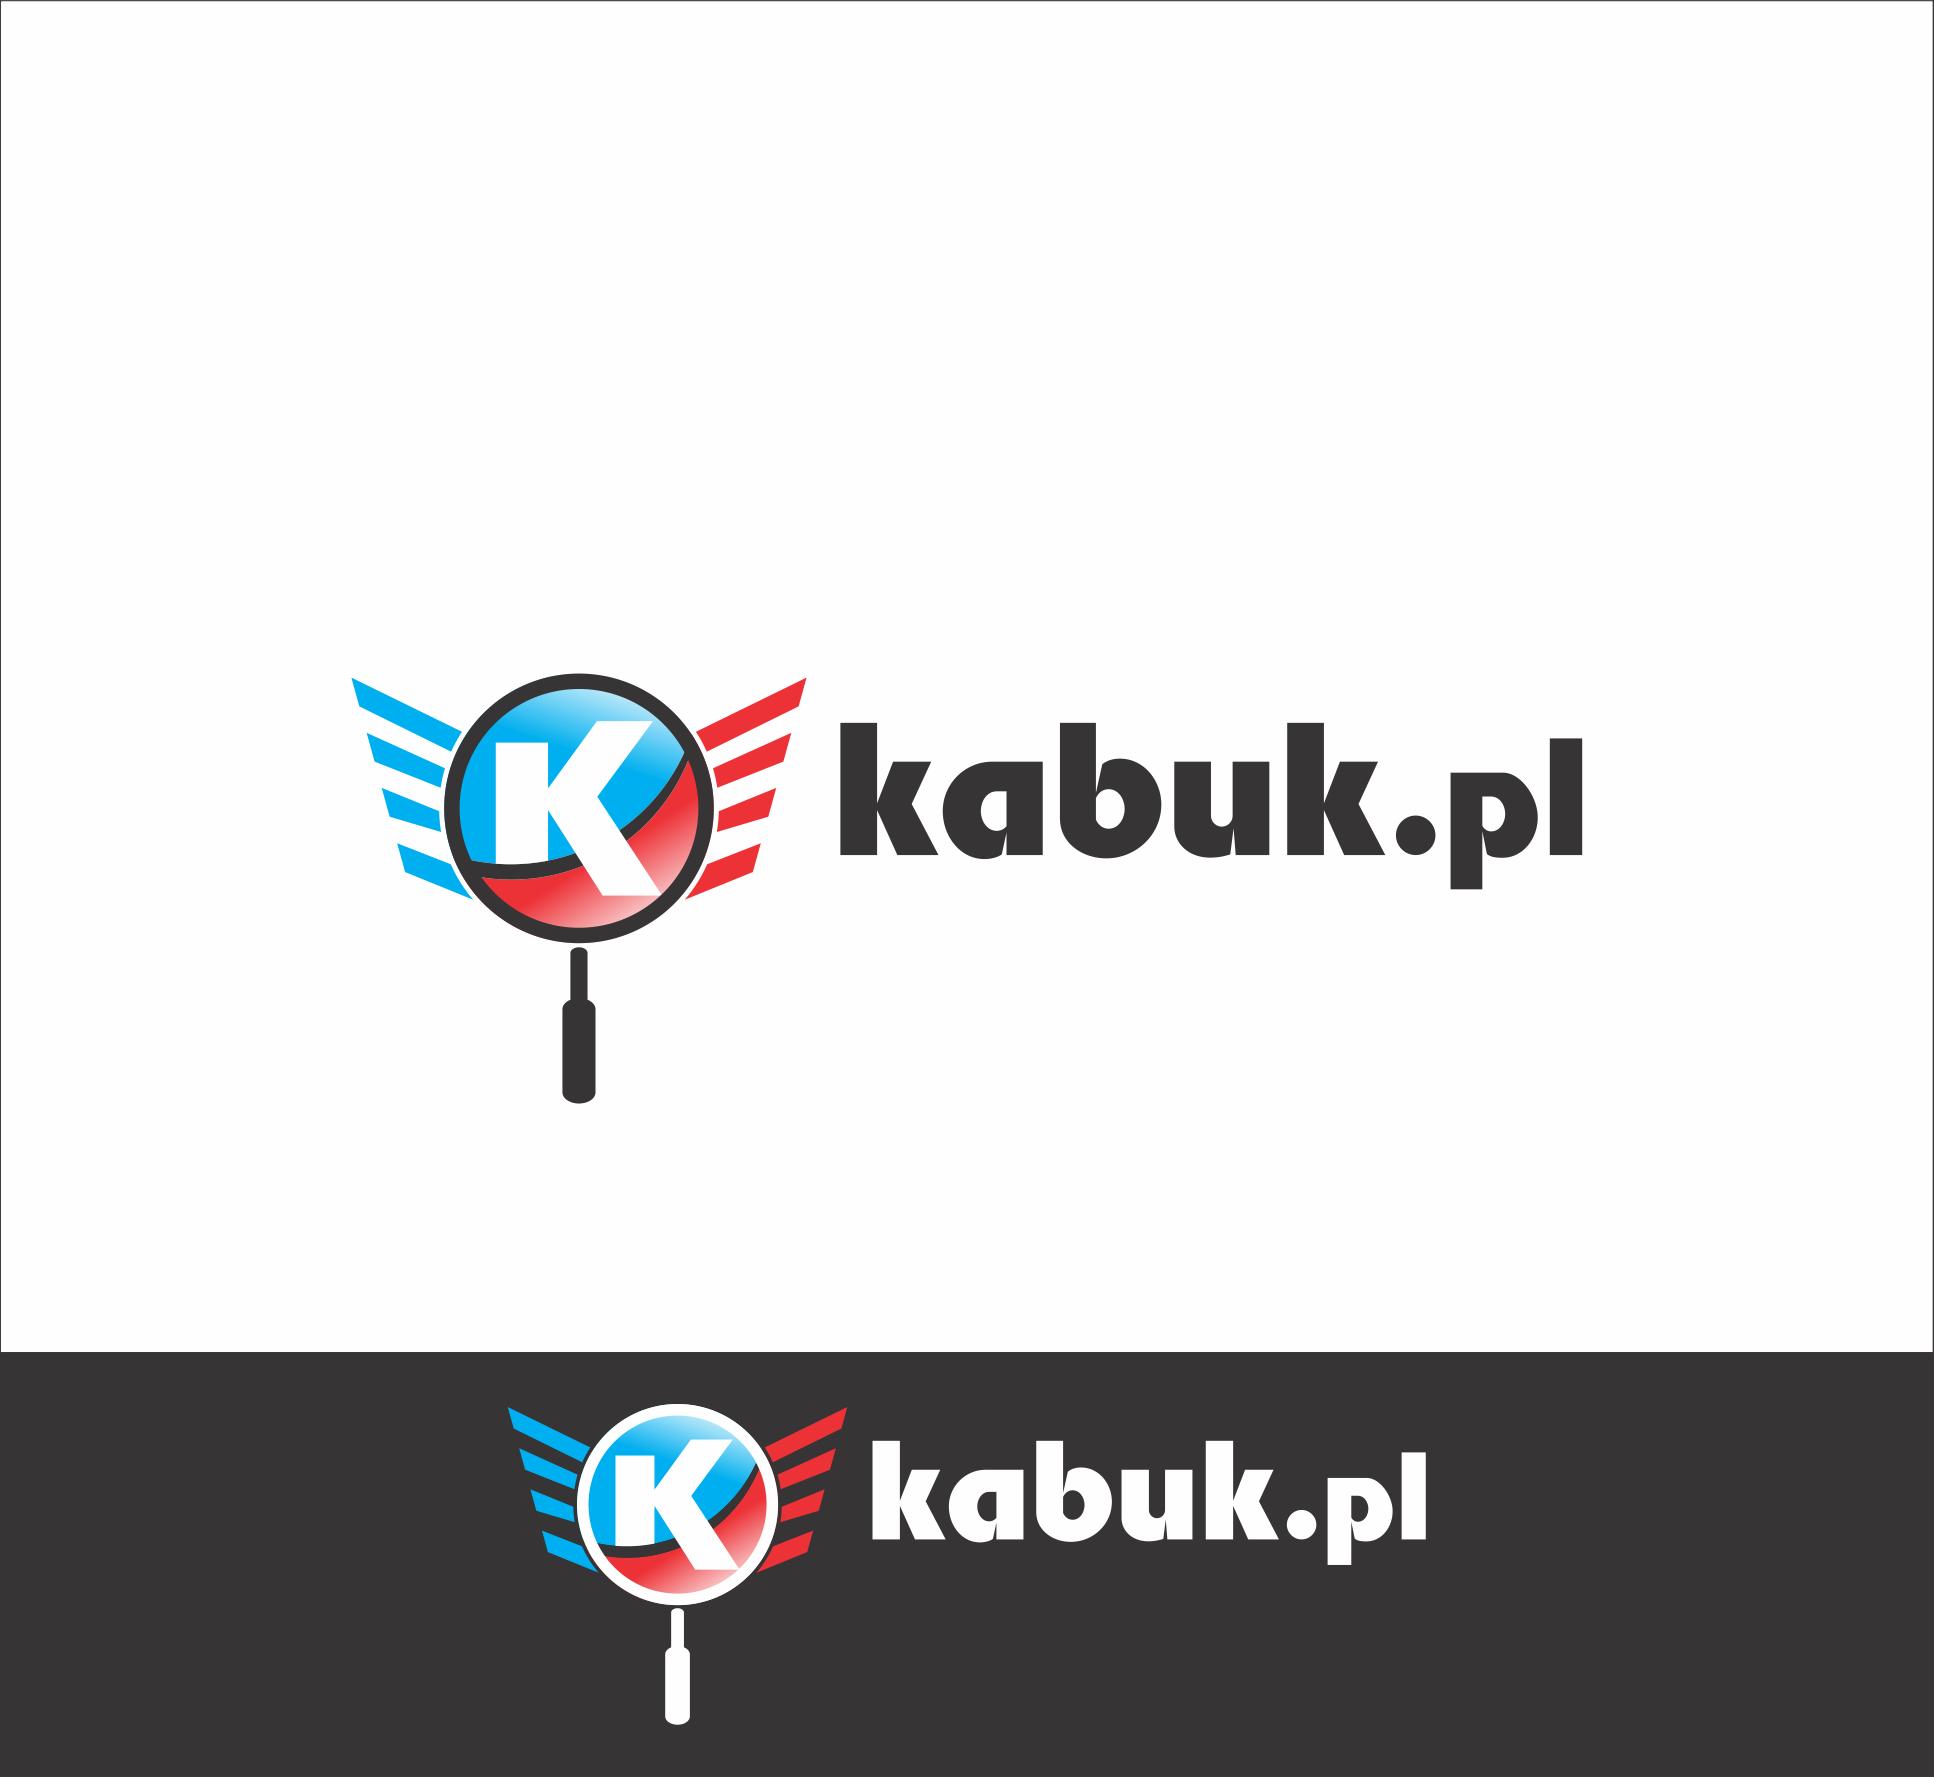 Logo Design Needed For Exciting New Company Ursus Taurus